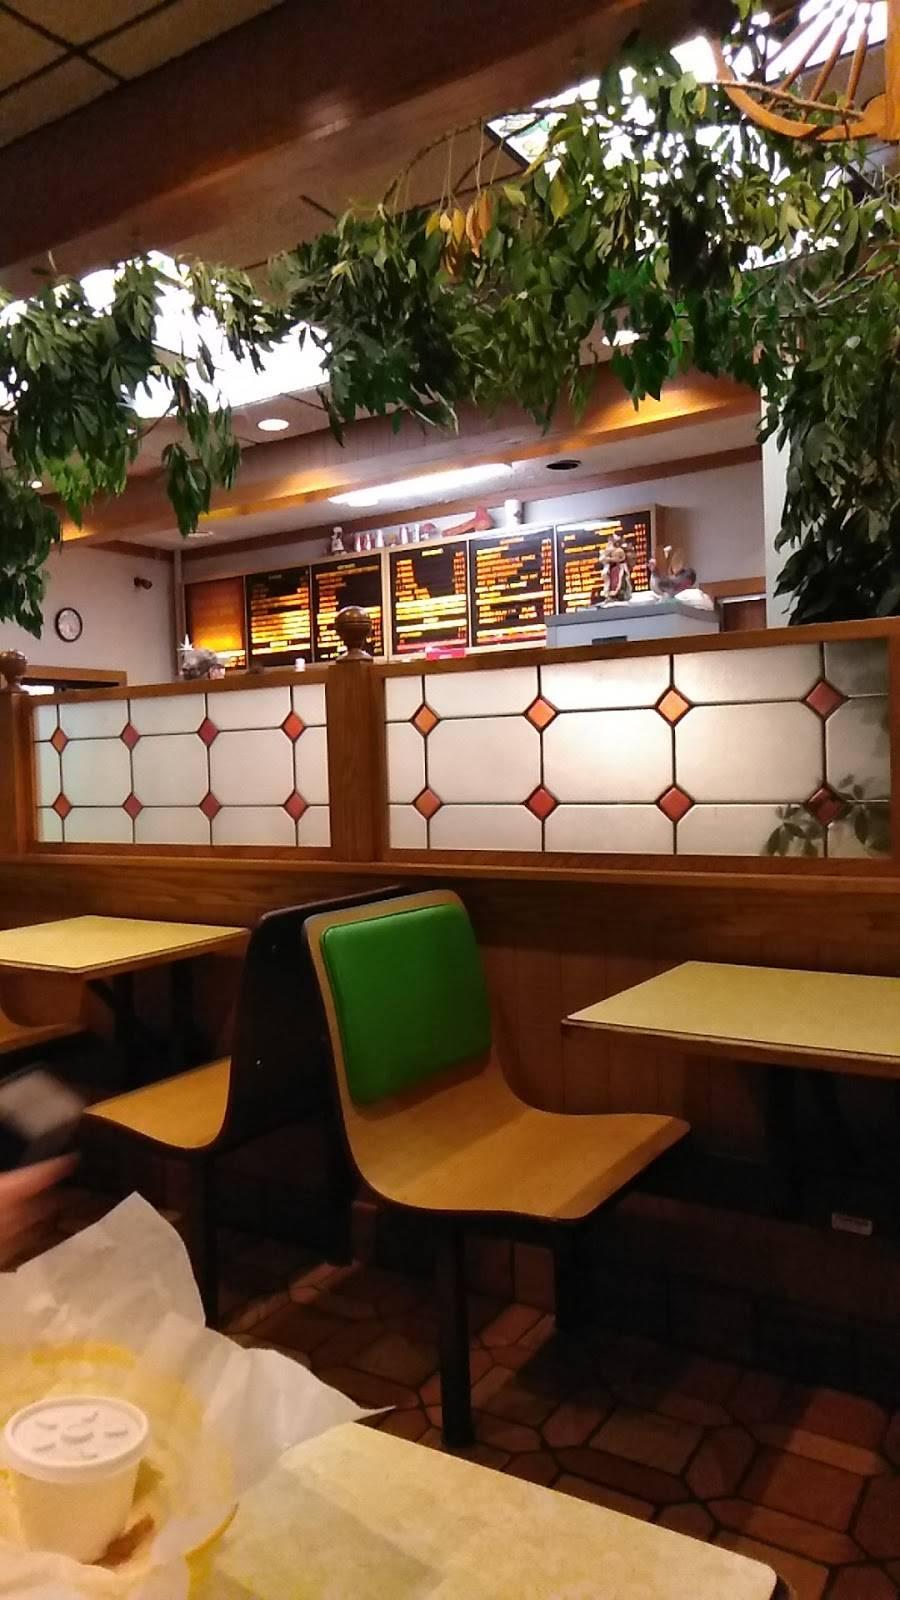 Golden Skillet | restaurant | 1029 Piney Forest Rd, Danville, VA 24540, USA | 4348362033 OR +1 434-836-2033